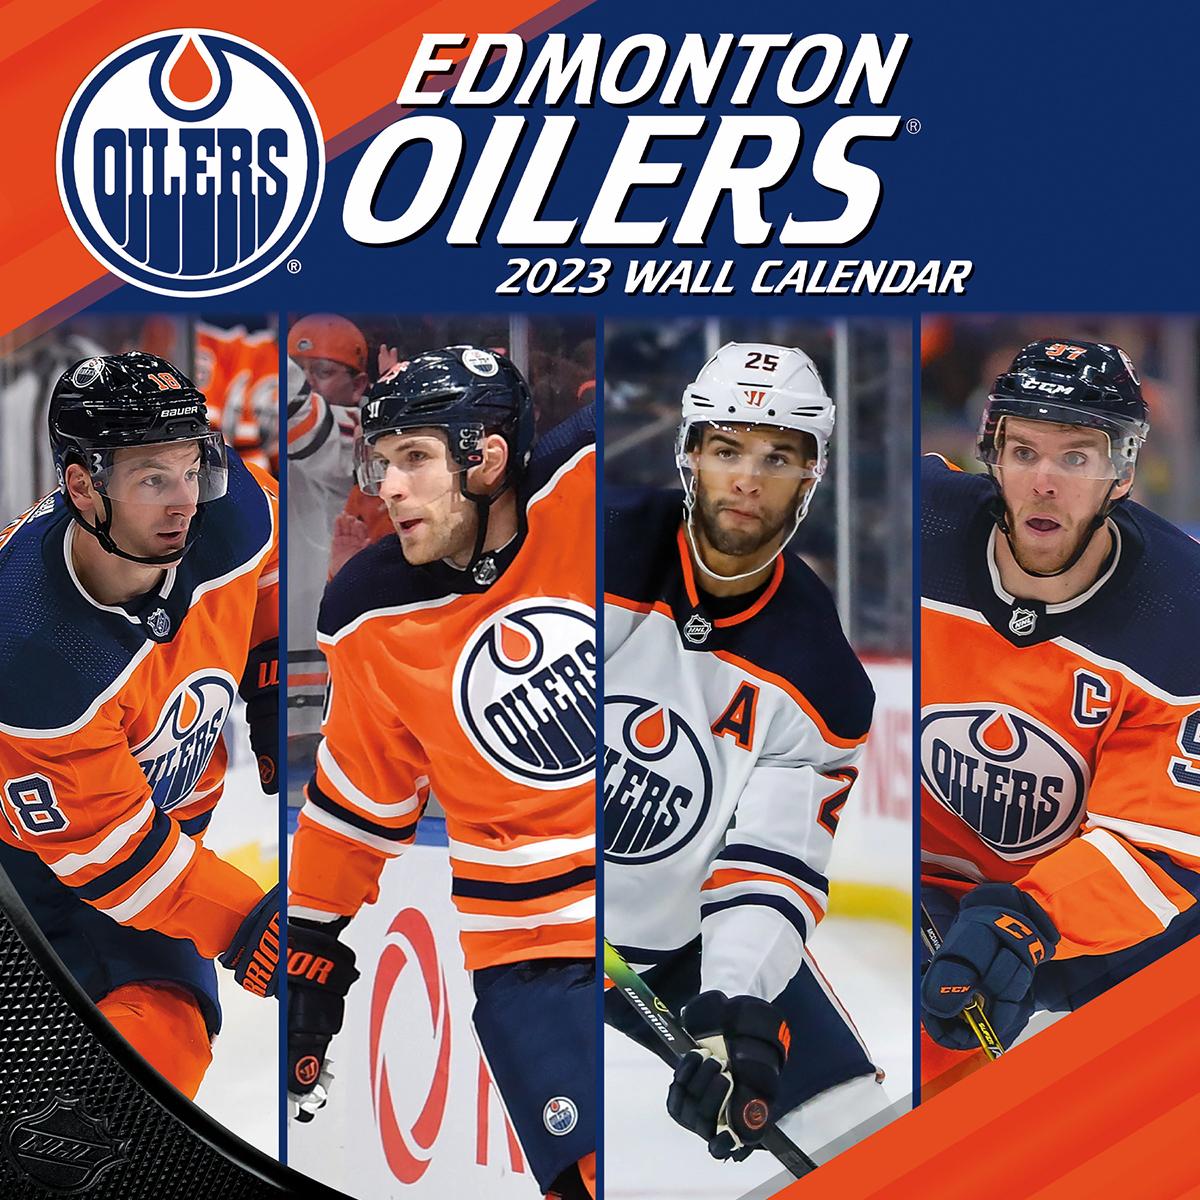 Edmonton Oilers 2019 NHL Wall Calendar - Buy at KHC Sports